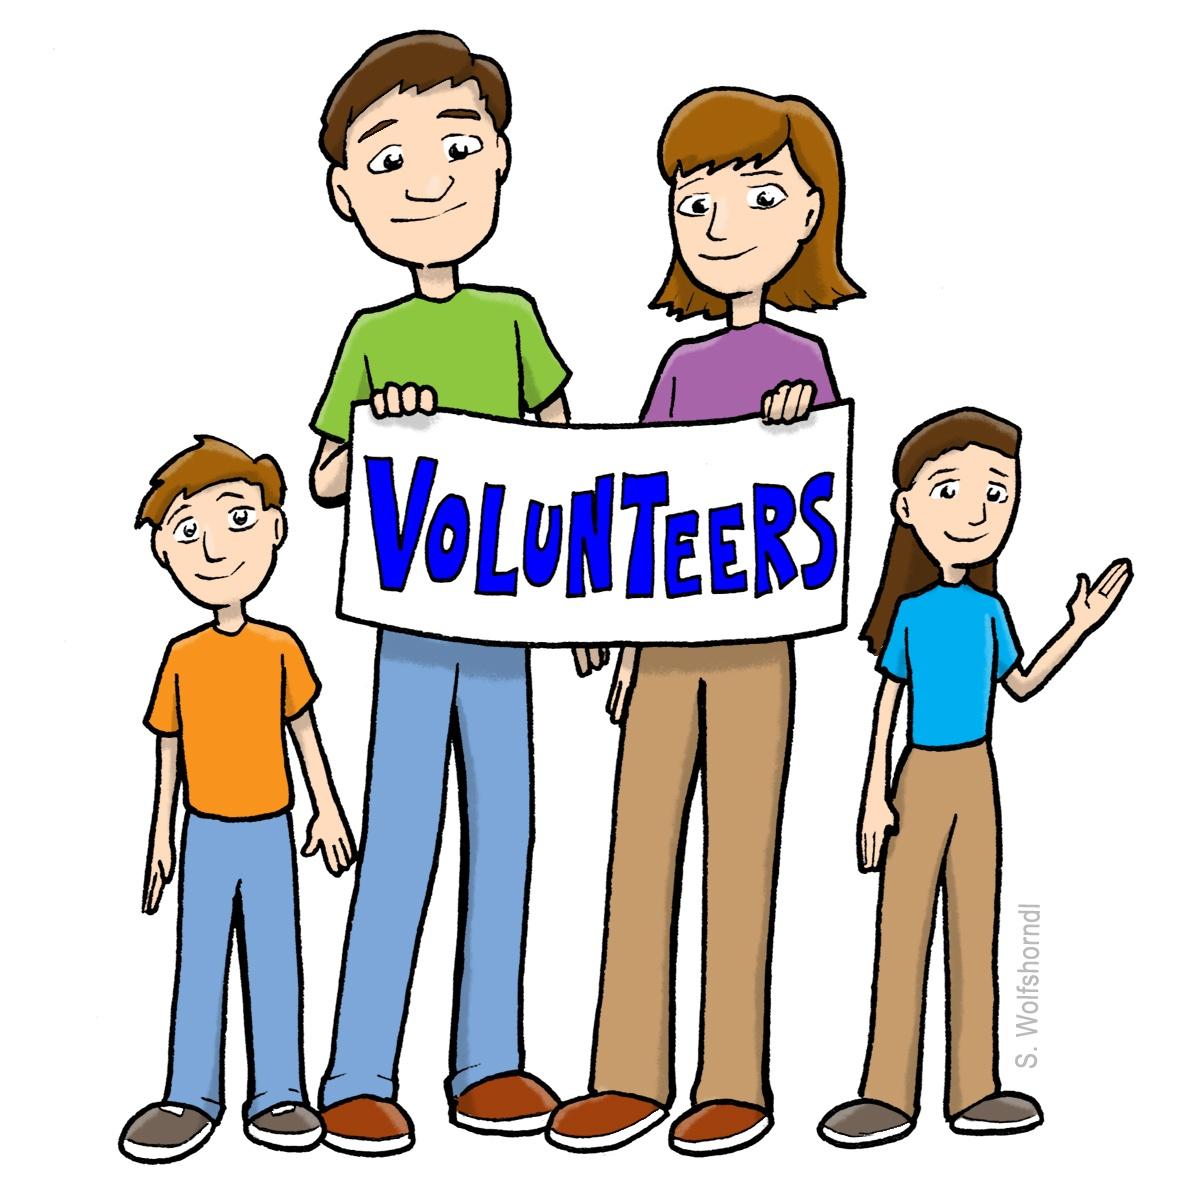 Church members who volunteer in the community clipart banner free Volunteer Appreciation Clipart | Free download best Volunteer ... banner free